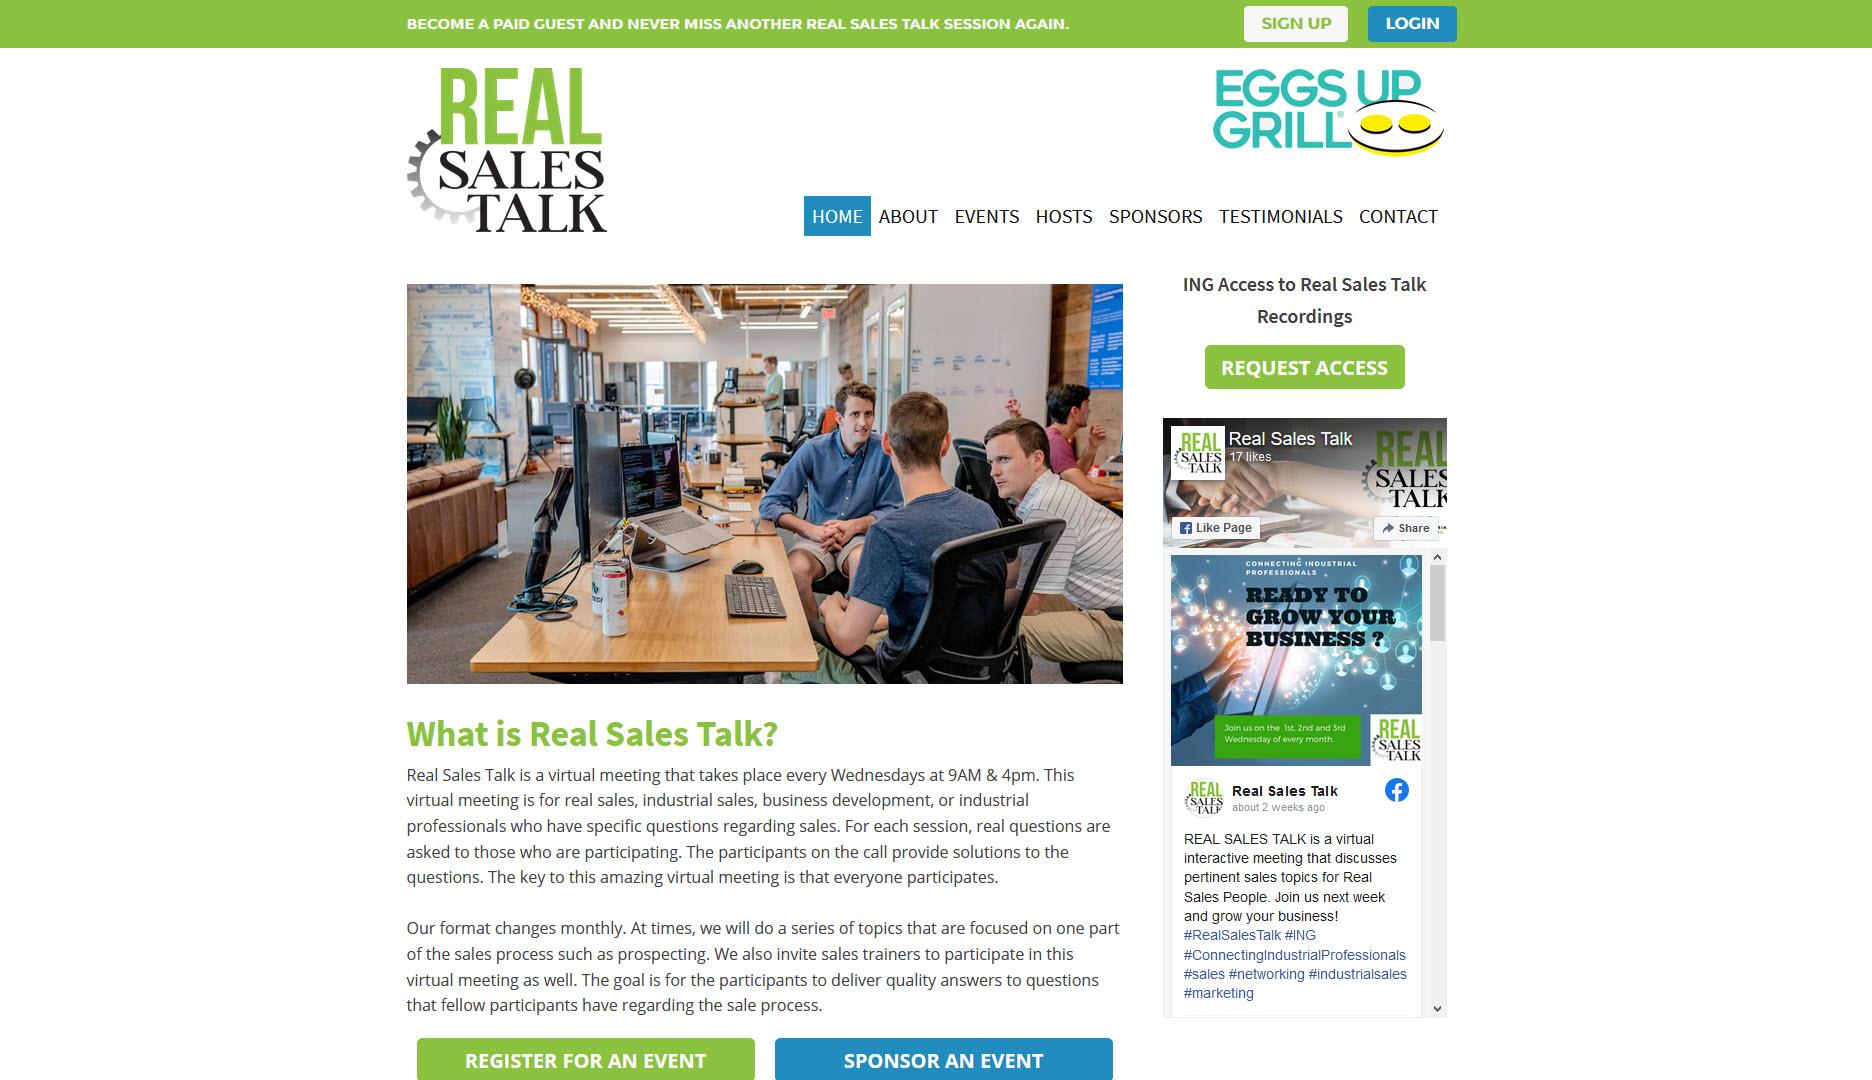 Real Sales Talk Website